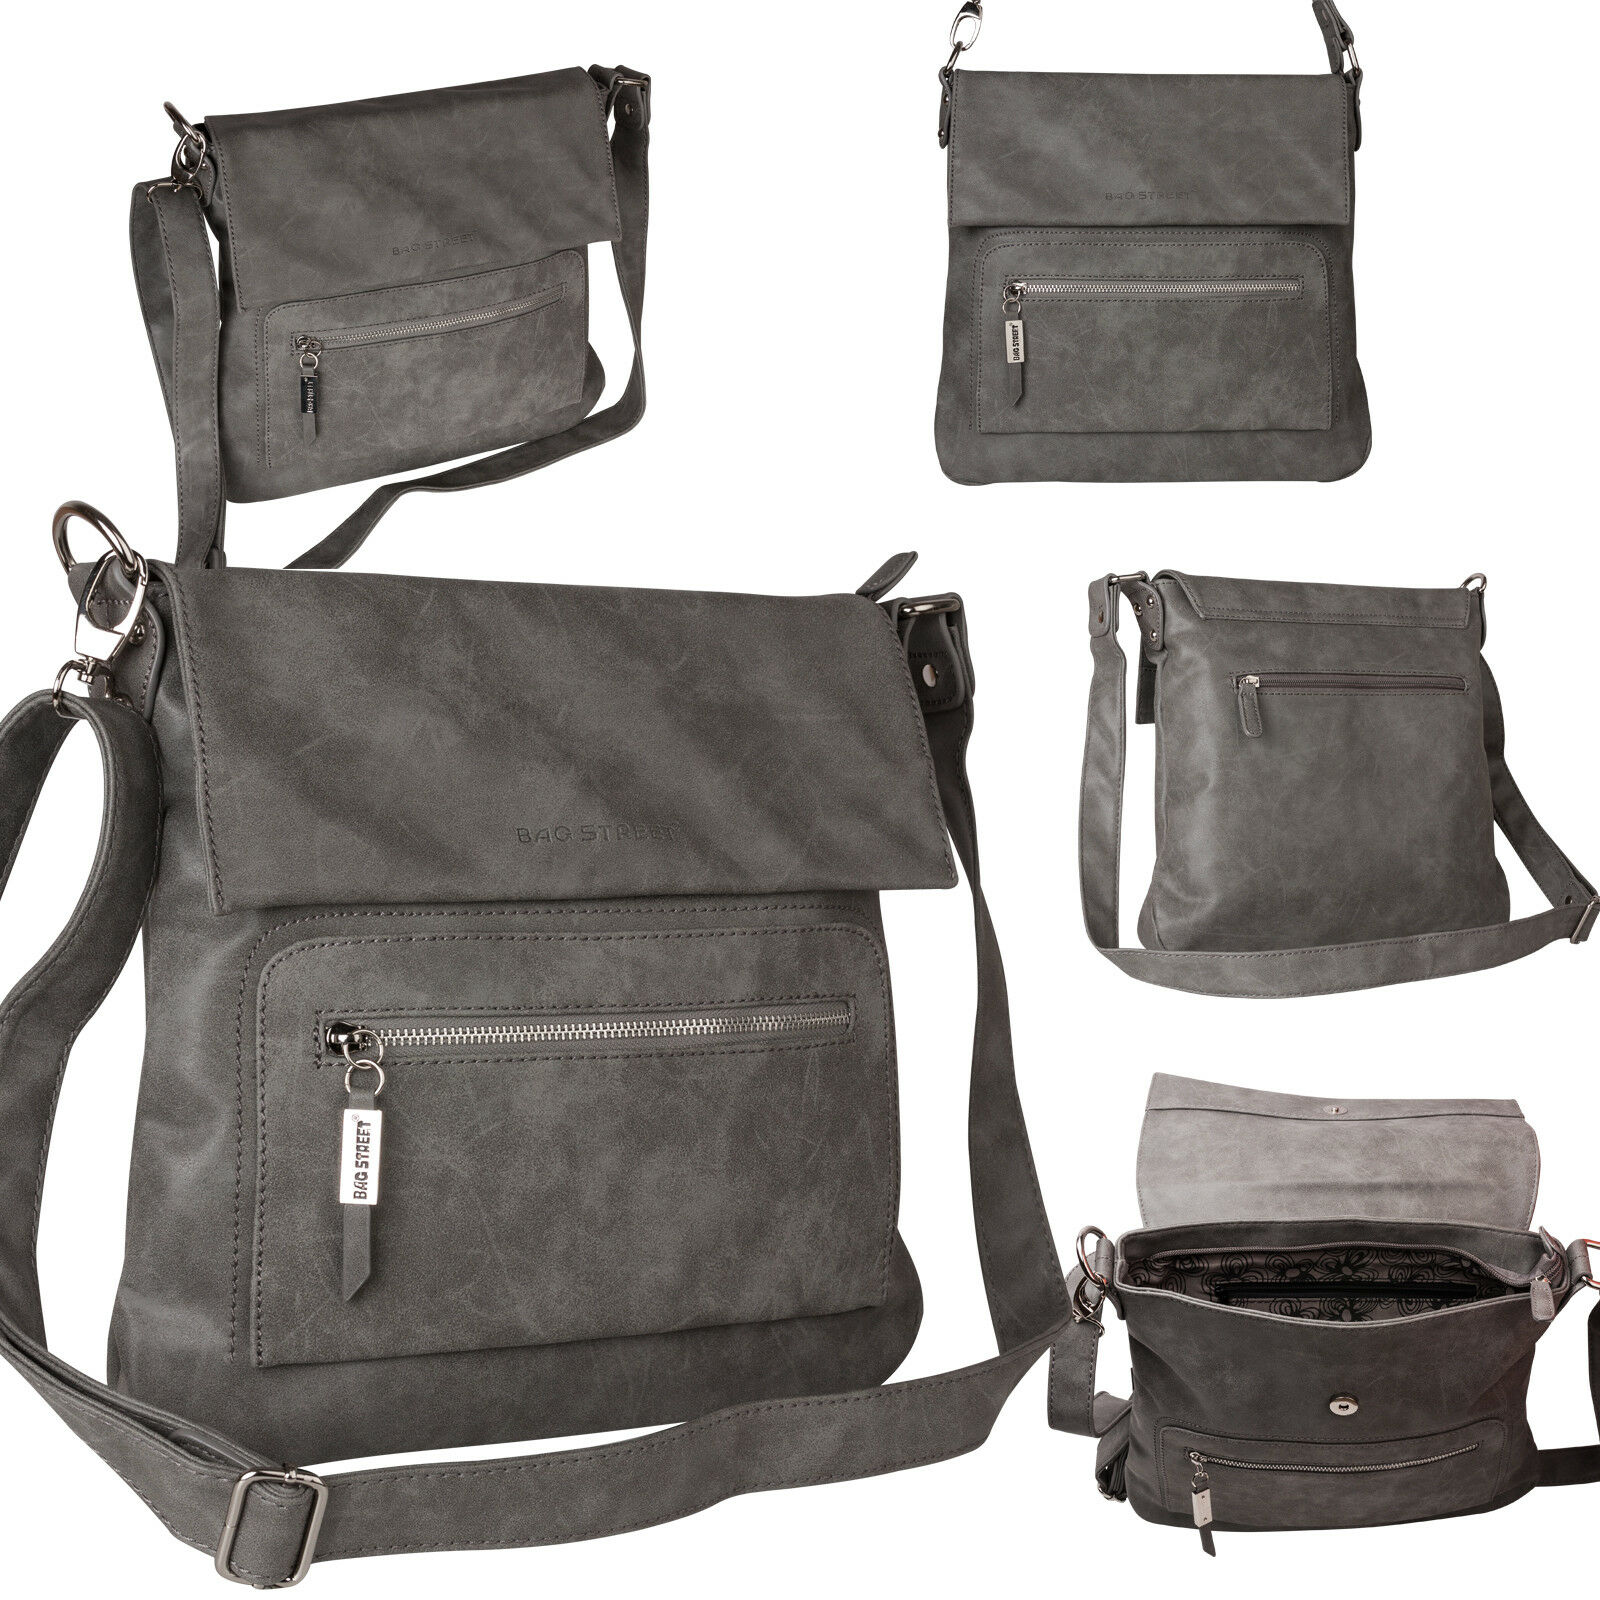 Bag Street Damentasche Umhängetasche Handtasche Schultertasche K2 T0103 Grau